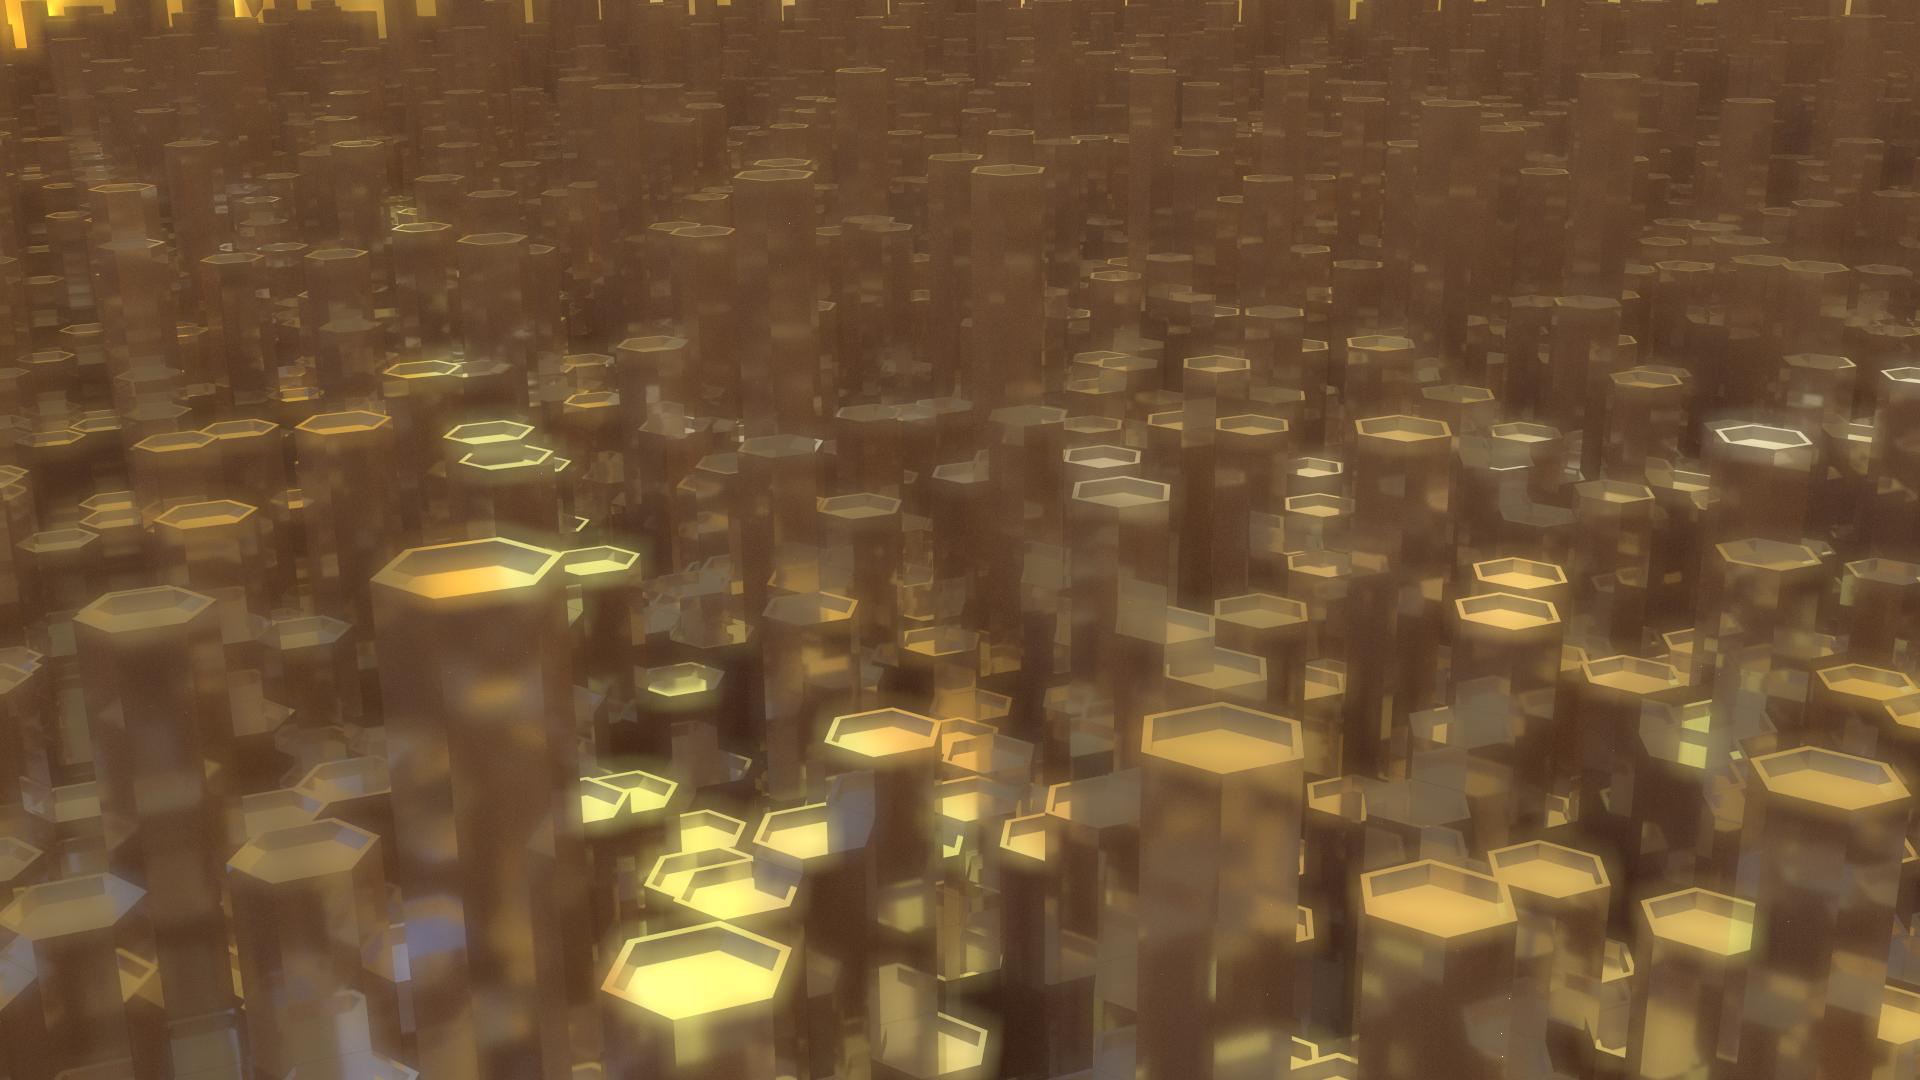 Hexagons-in-the-Sunset-x-OC-wallpaper-wp5207461